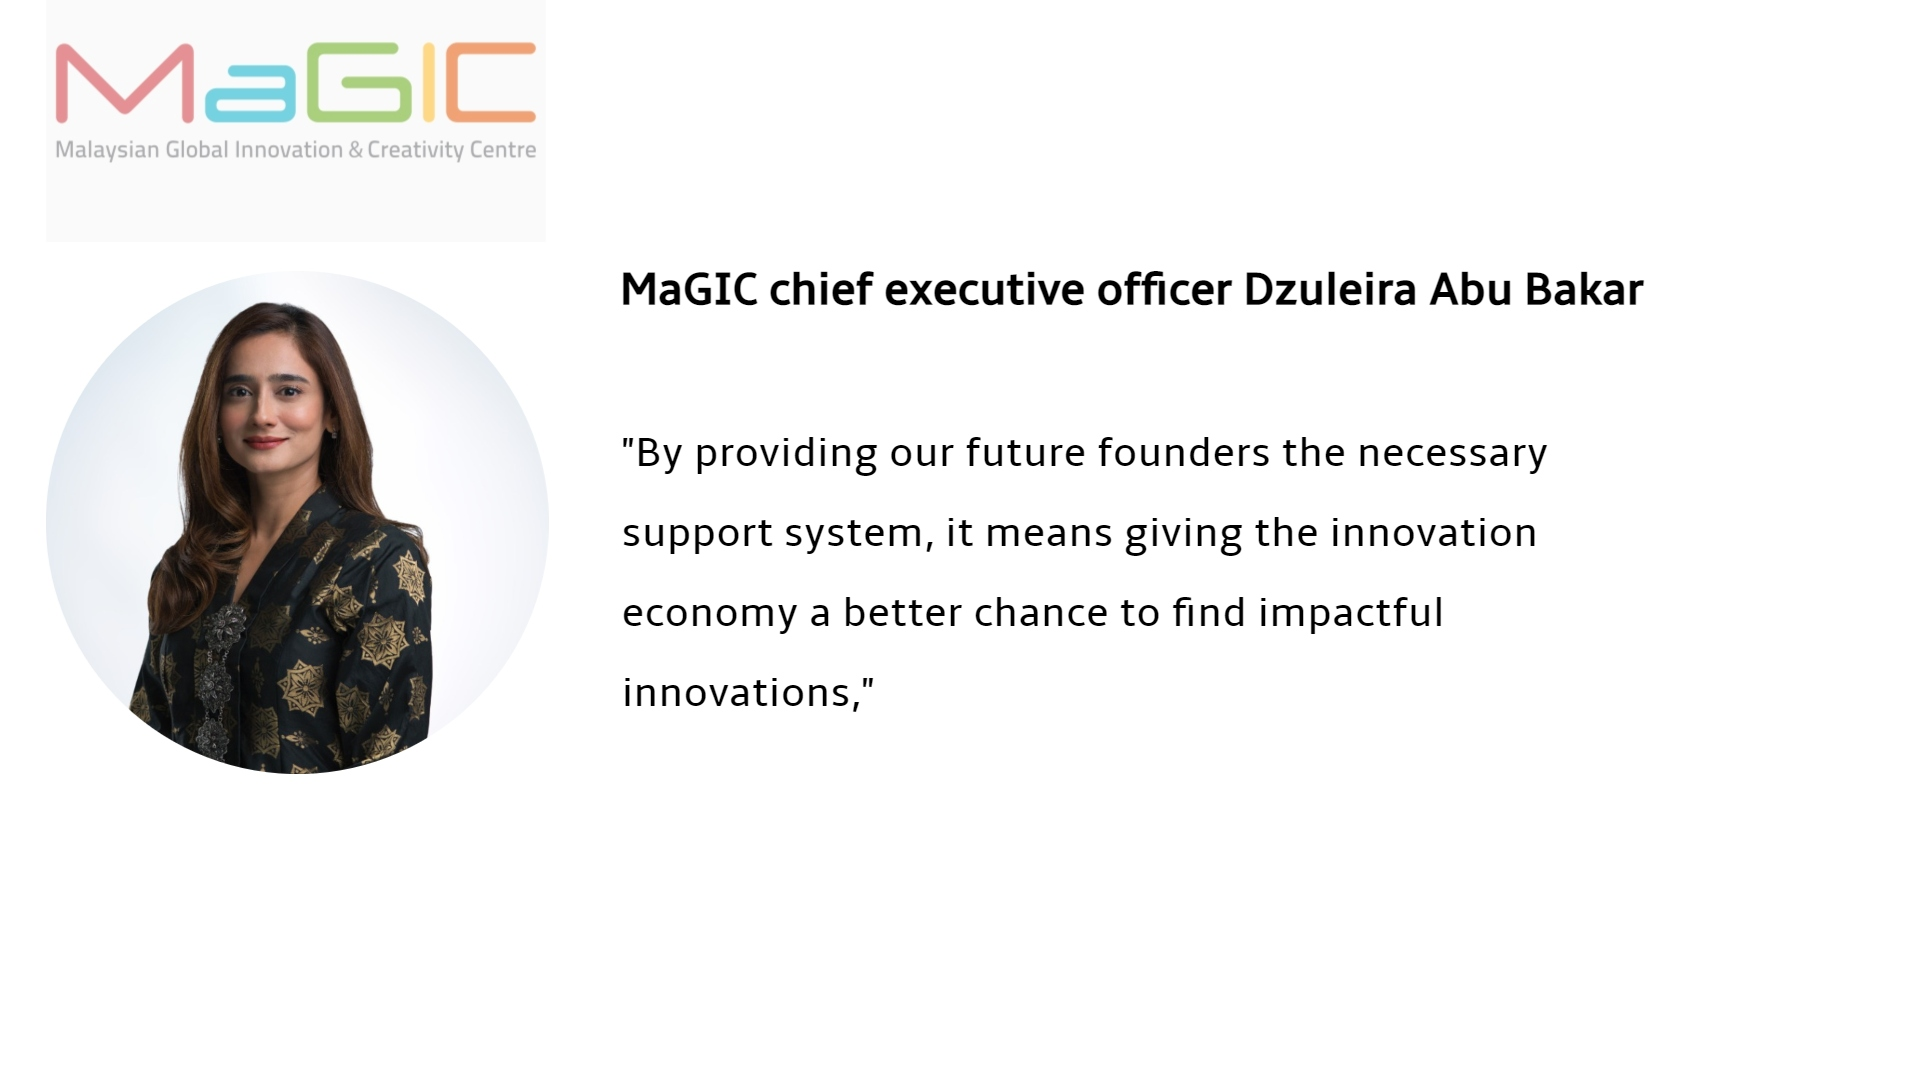 MaGIC Chief Executive Officer Dzuleira Abu Bakar